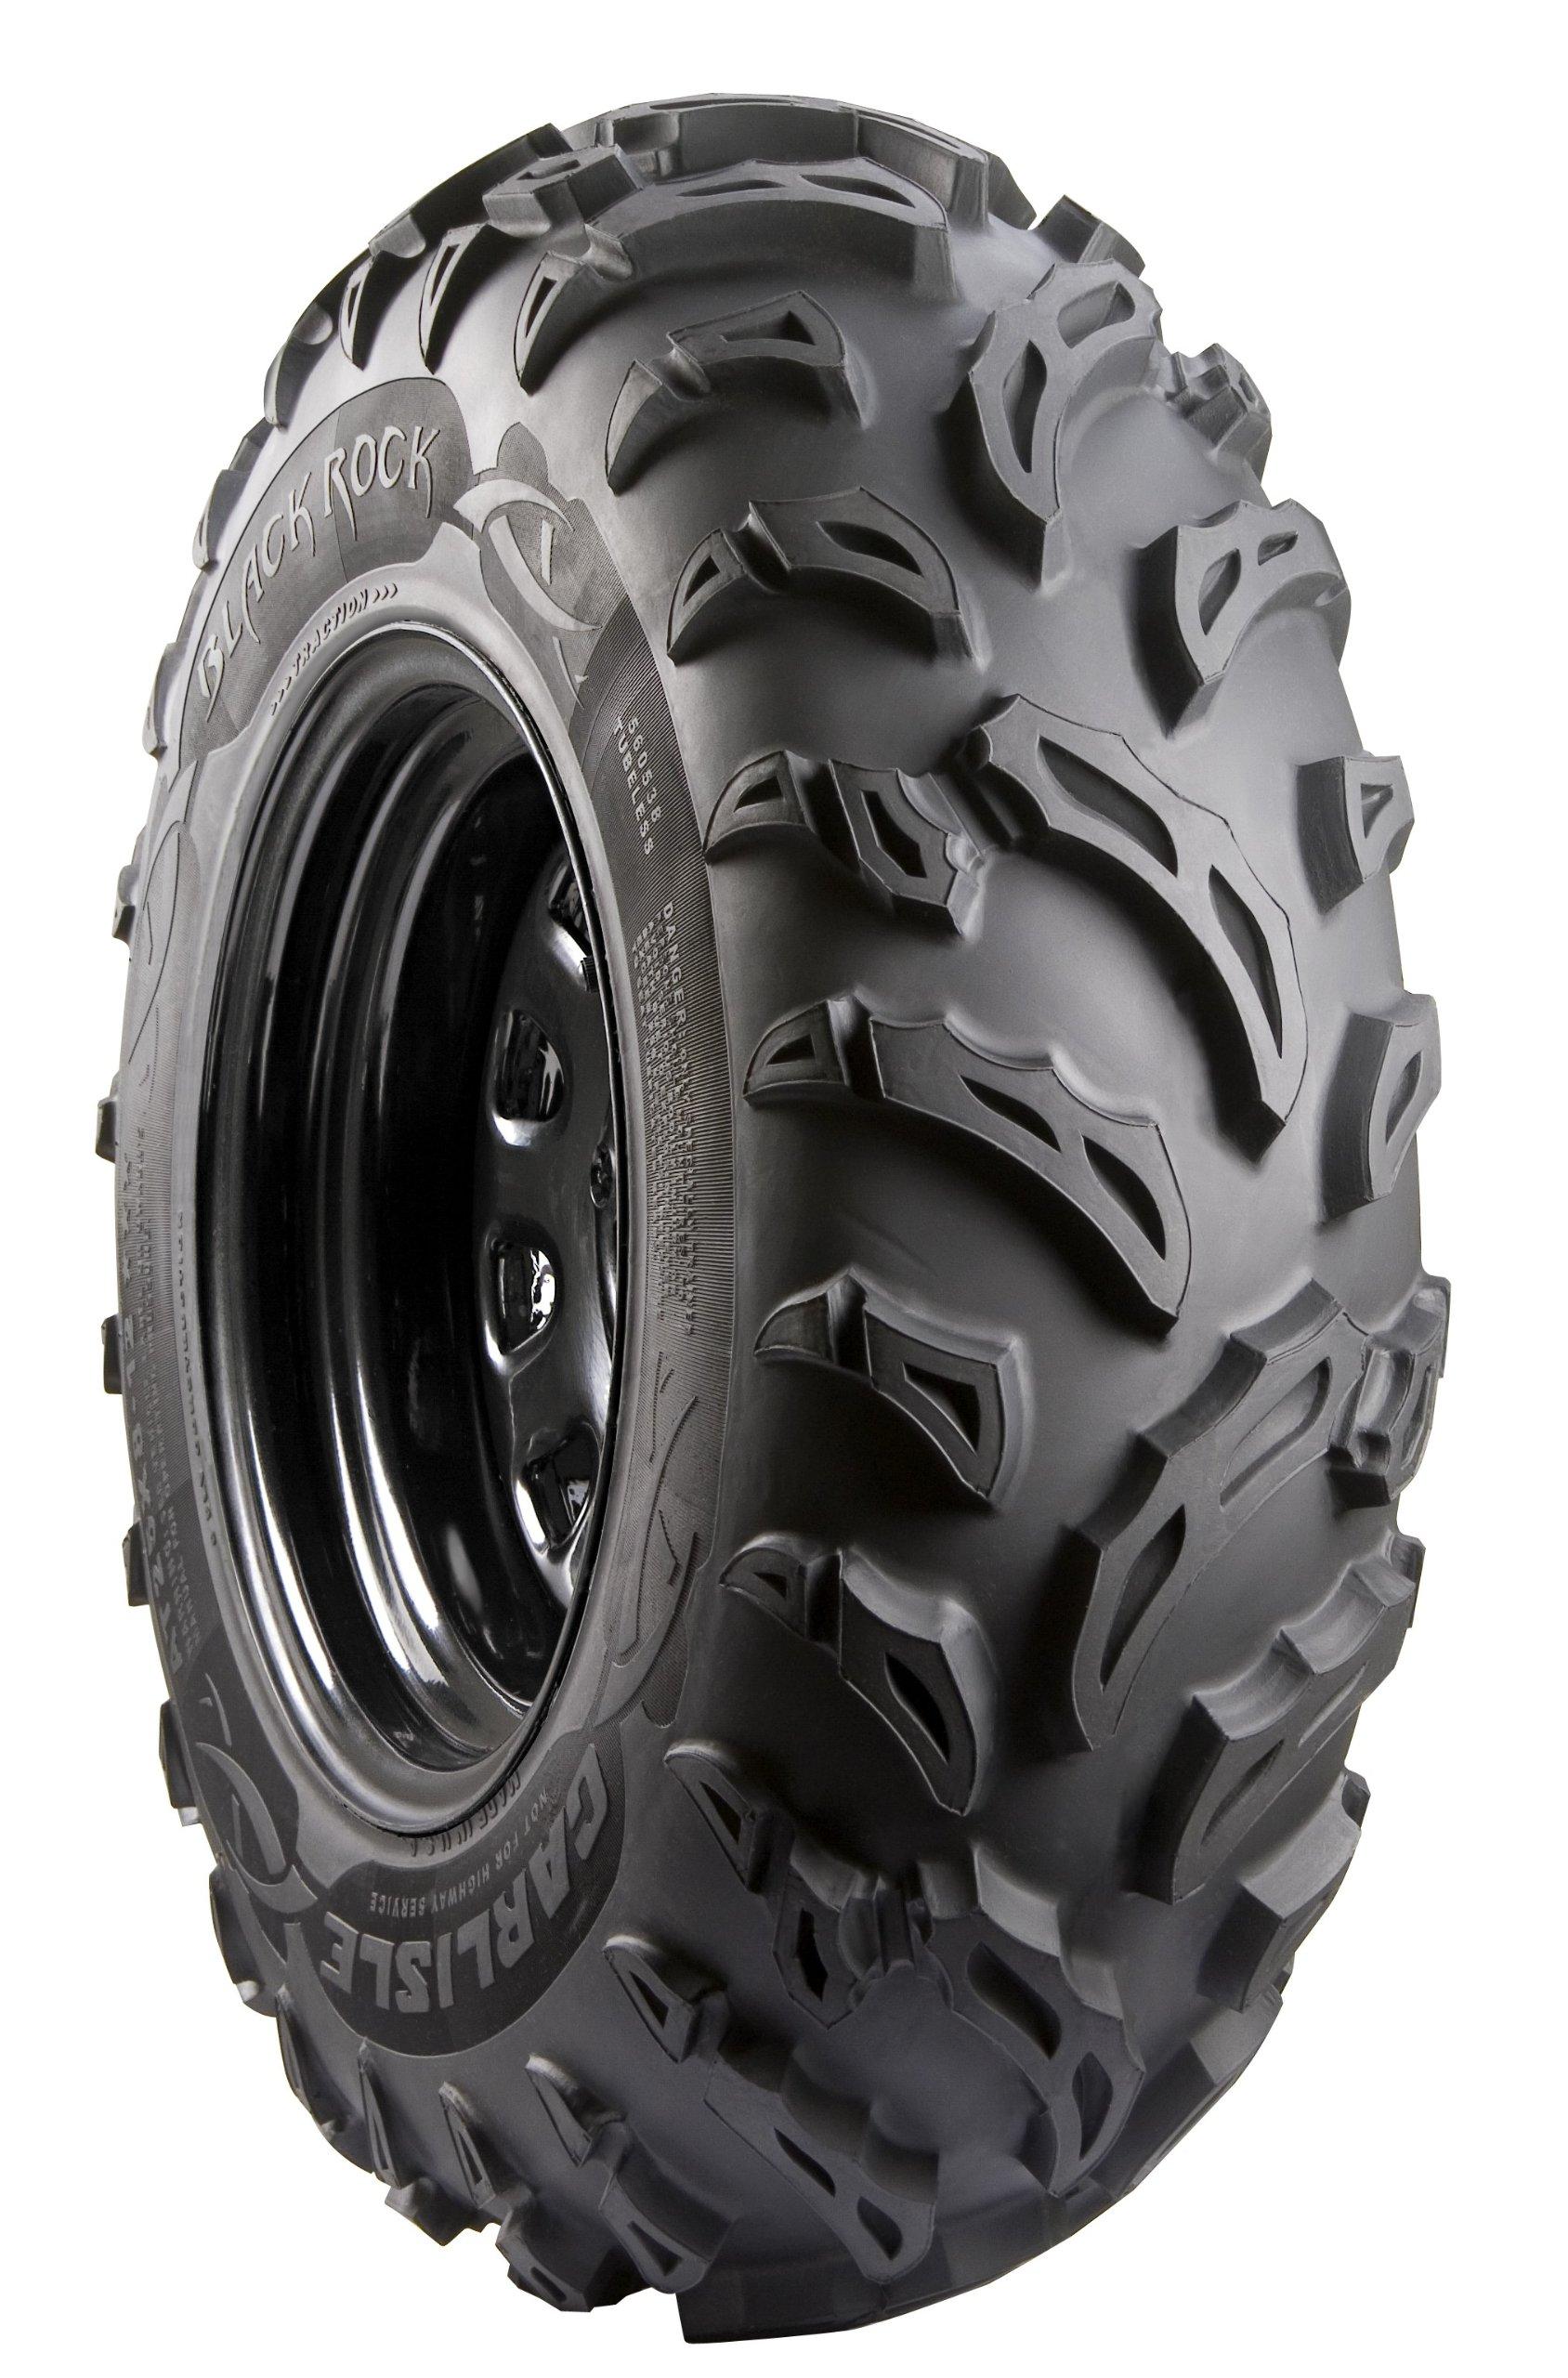 Carlisle Black Rock ATV Tire - 25X8-12